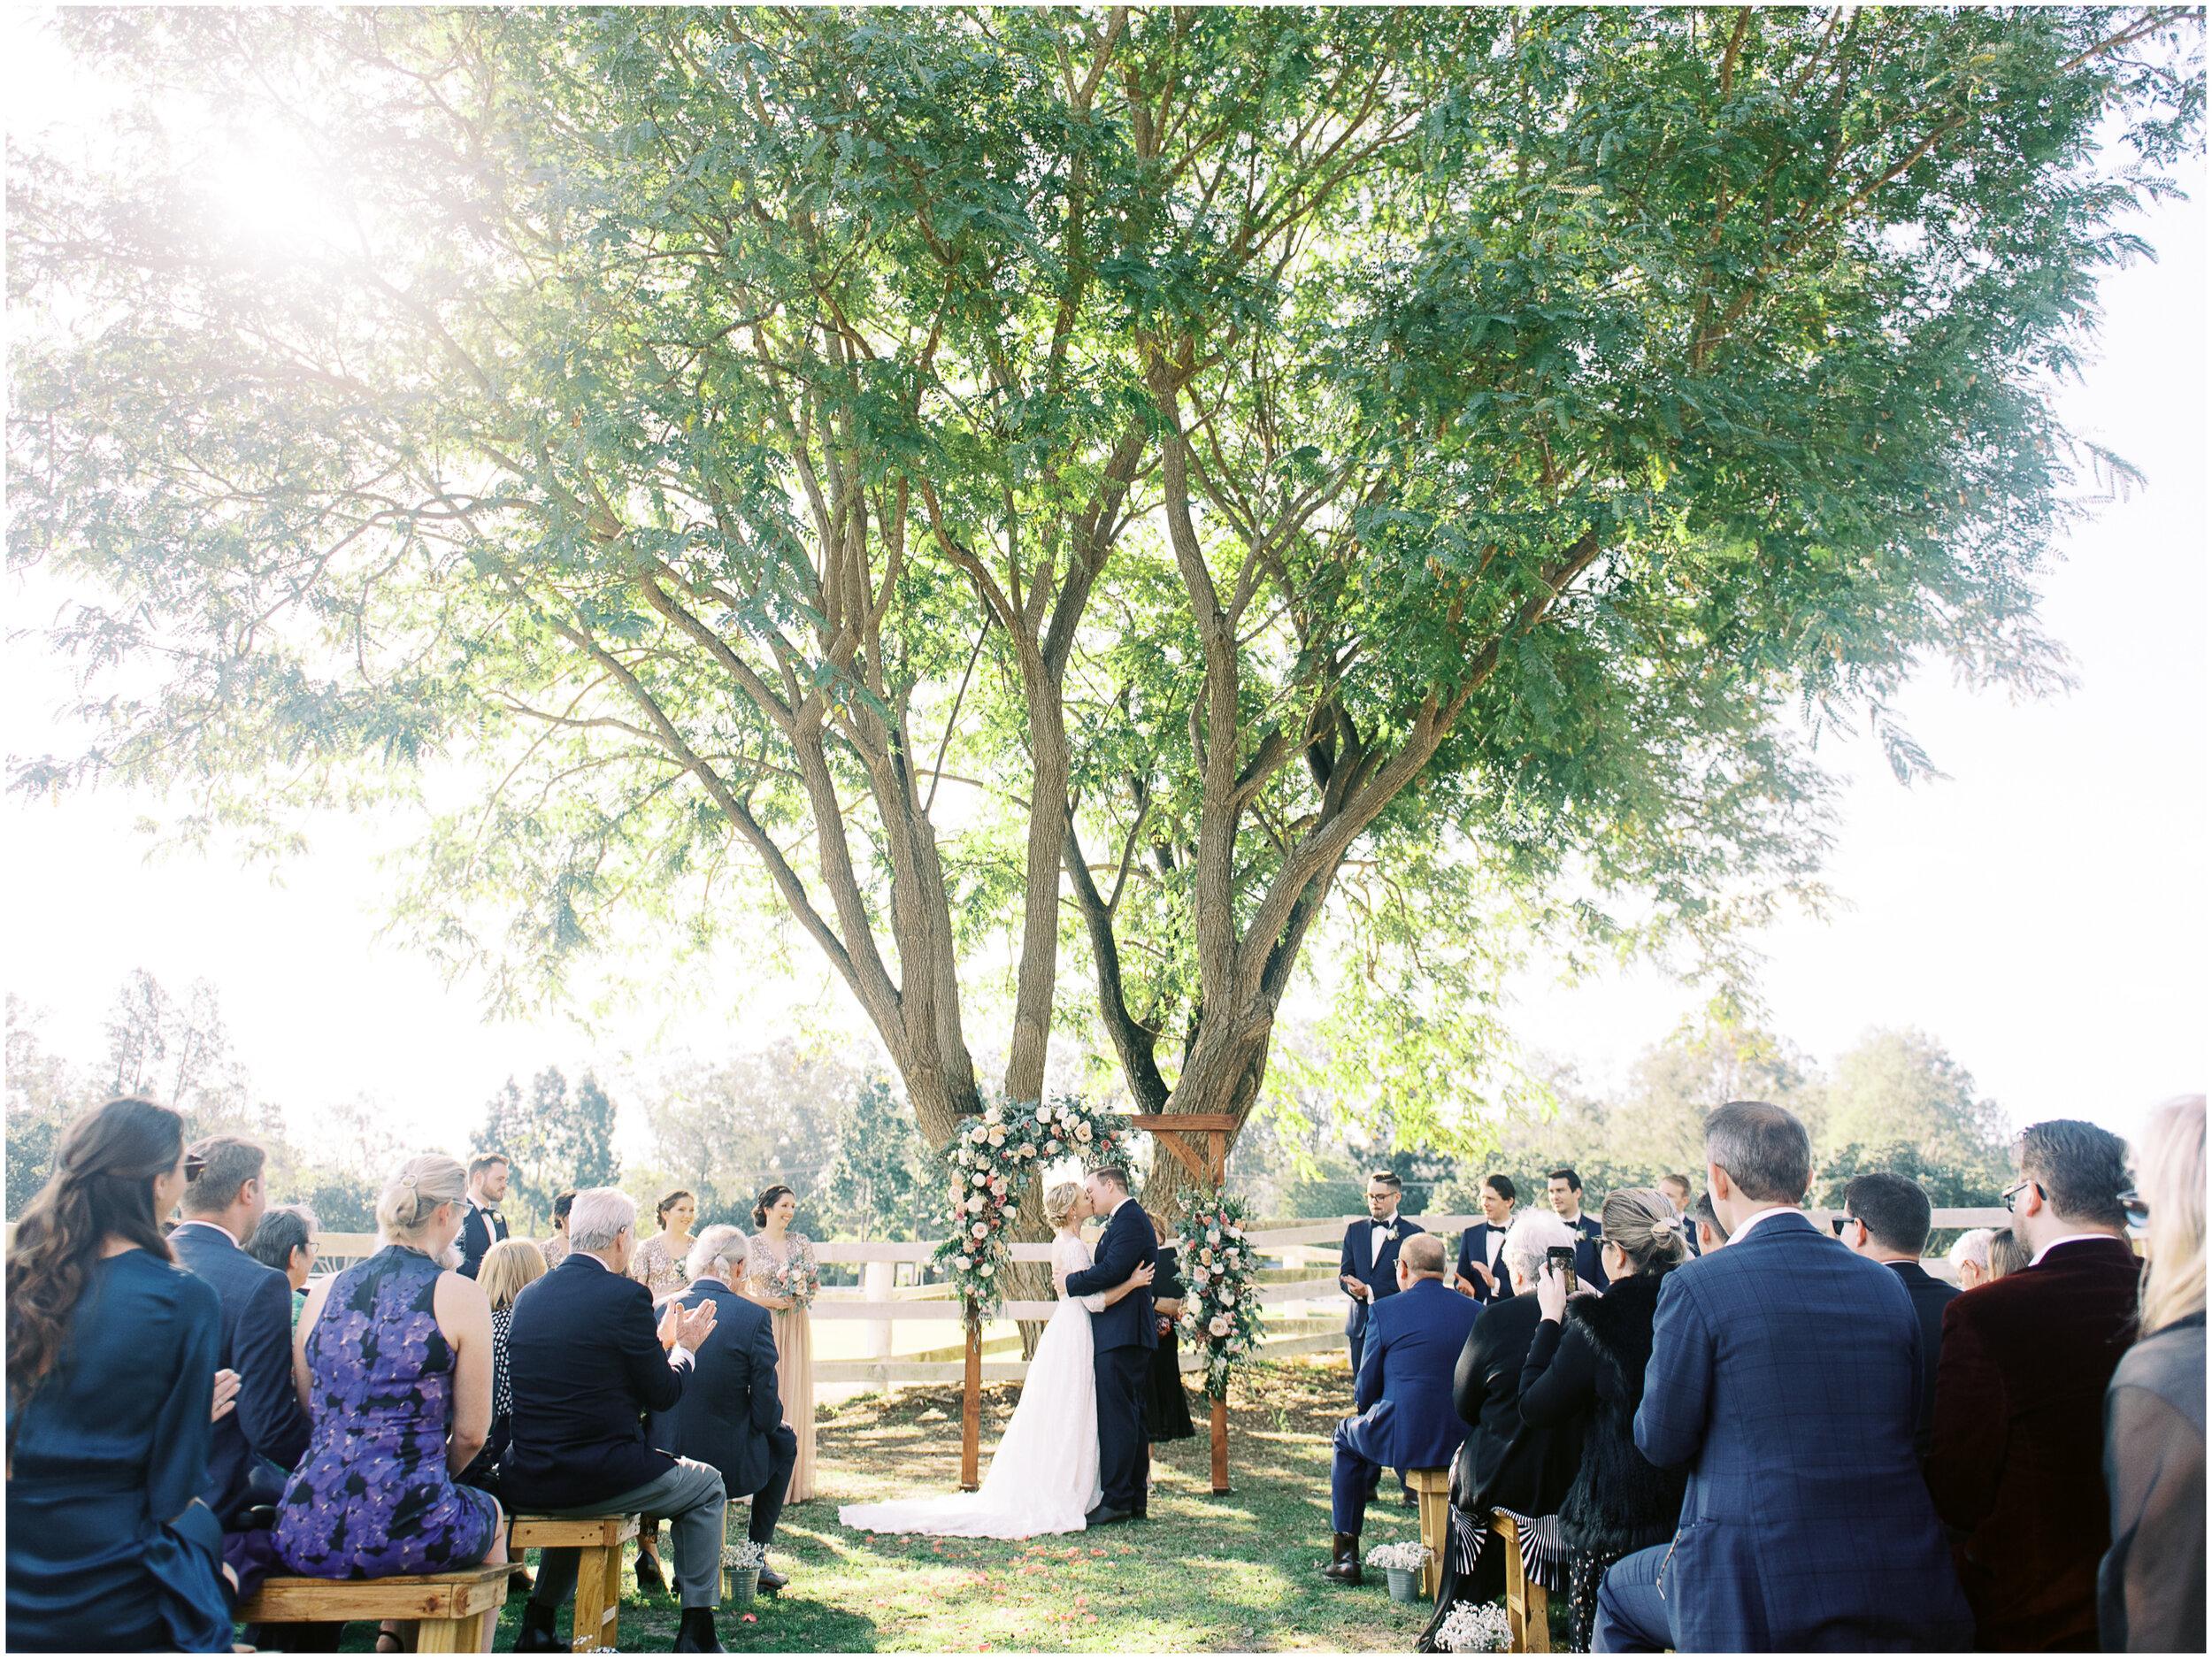 brisbane-film-wedding-photographer-lauren-olivia-luxury-wedding-australia-01-08.jpg